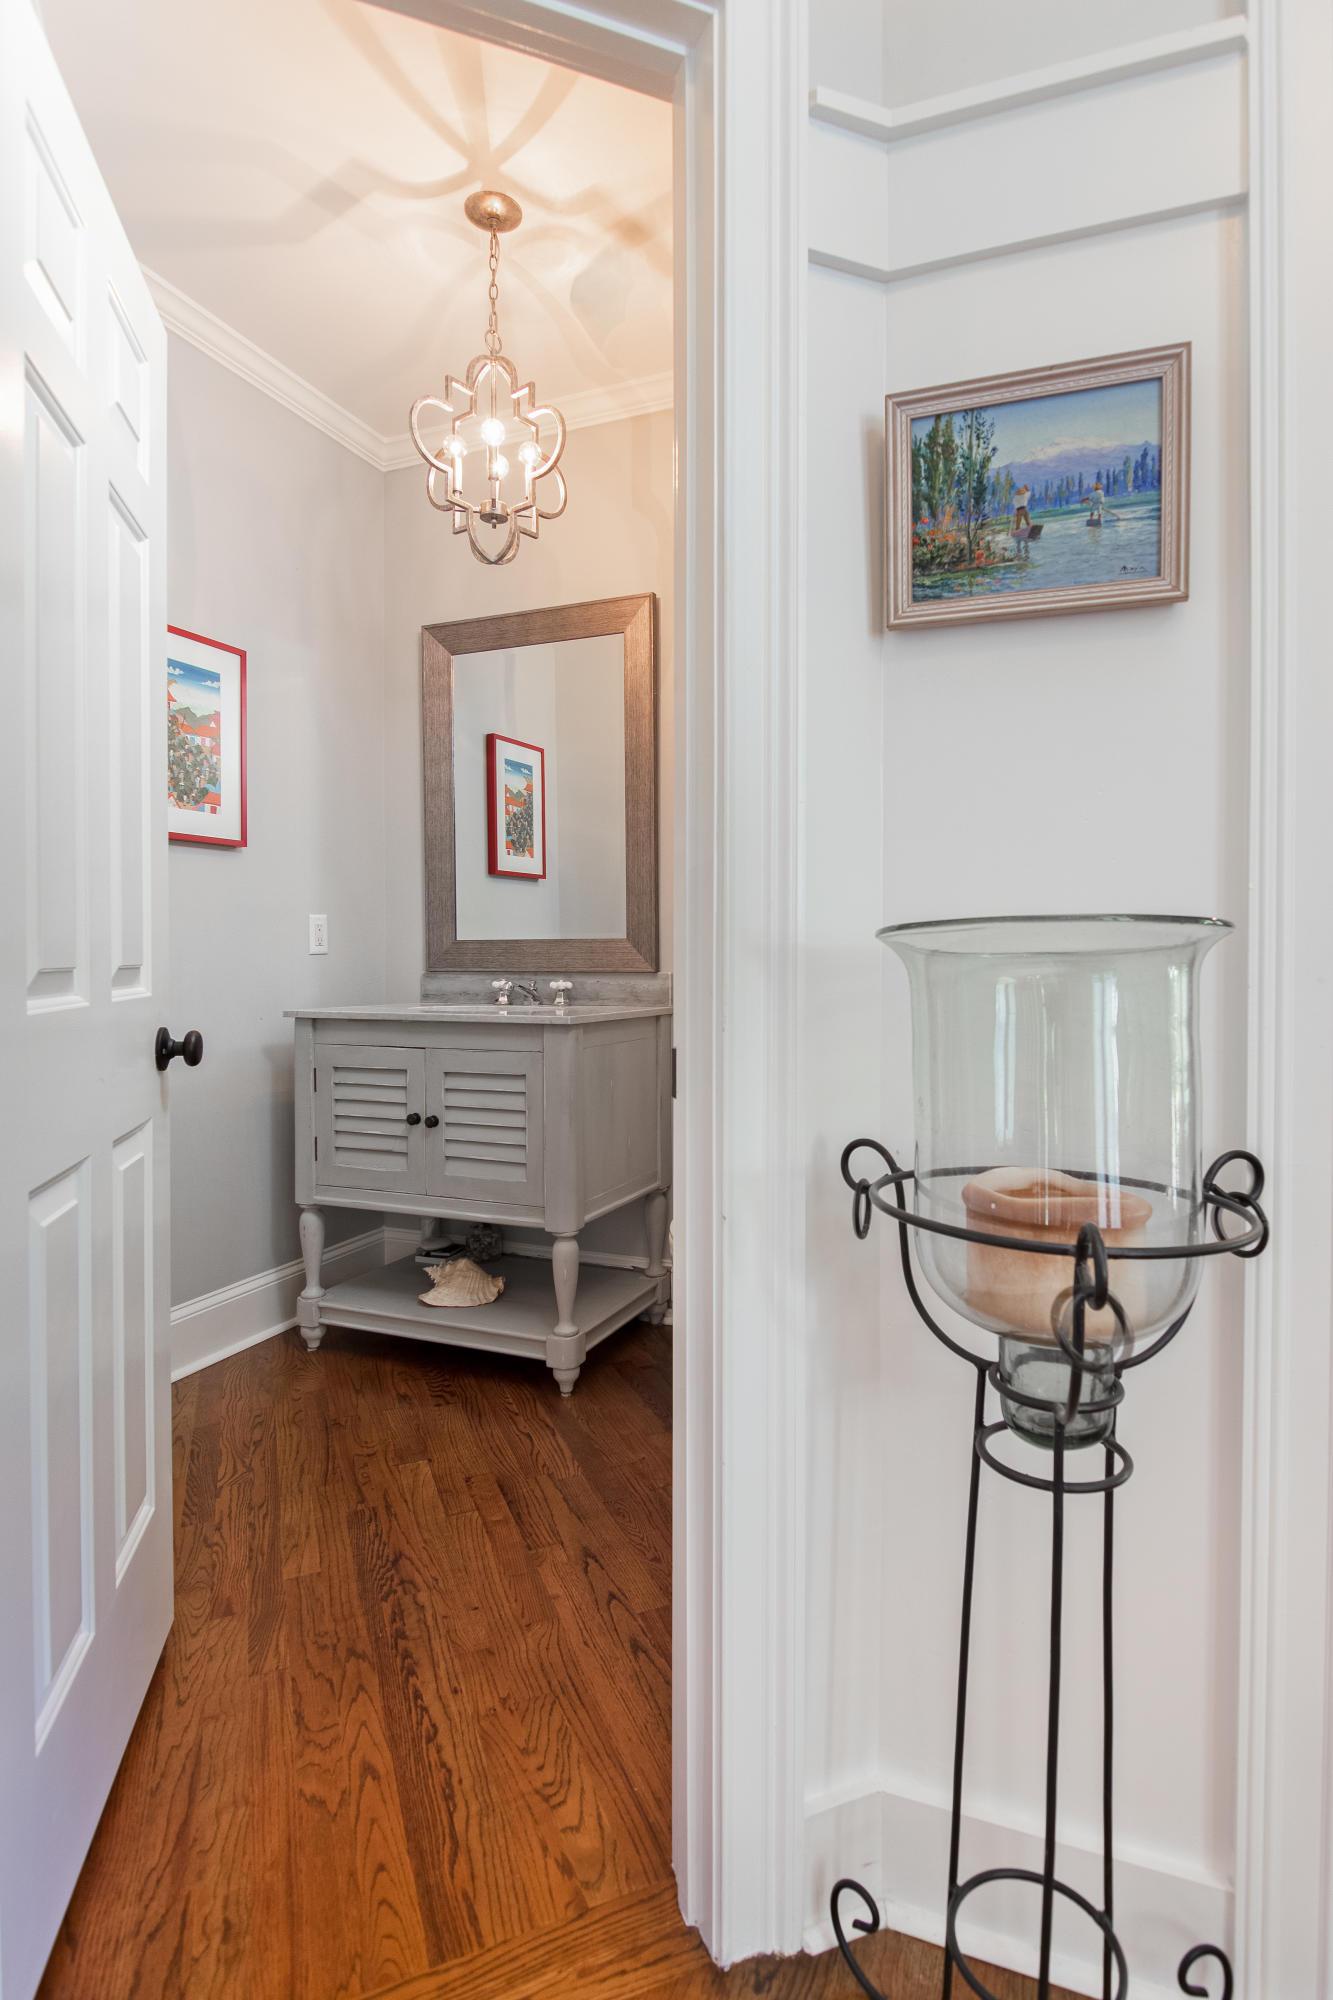 Dunes West Homes For Sale - 3721 Colonel Vanderhorst, Mount Pleasant, SC - 16